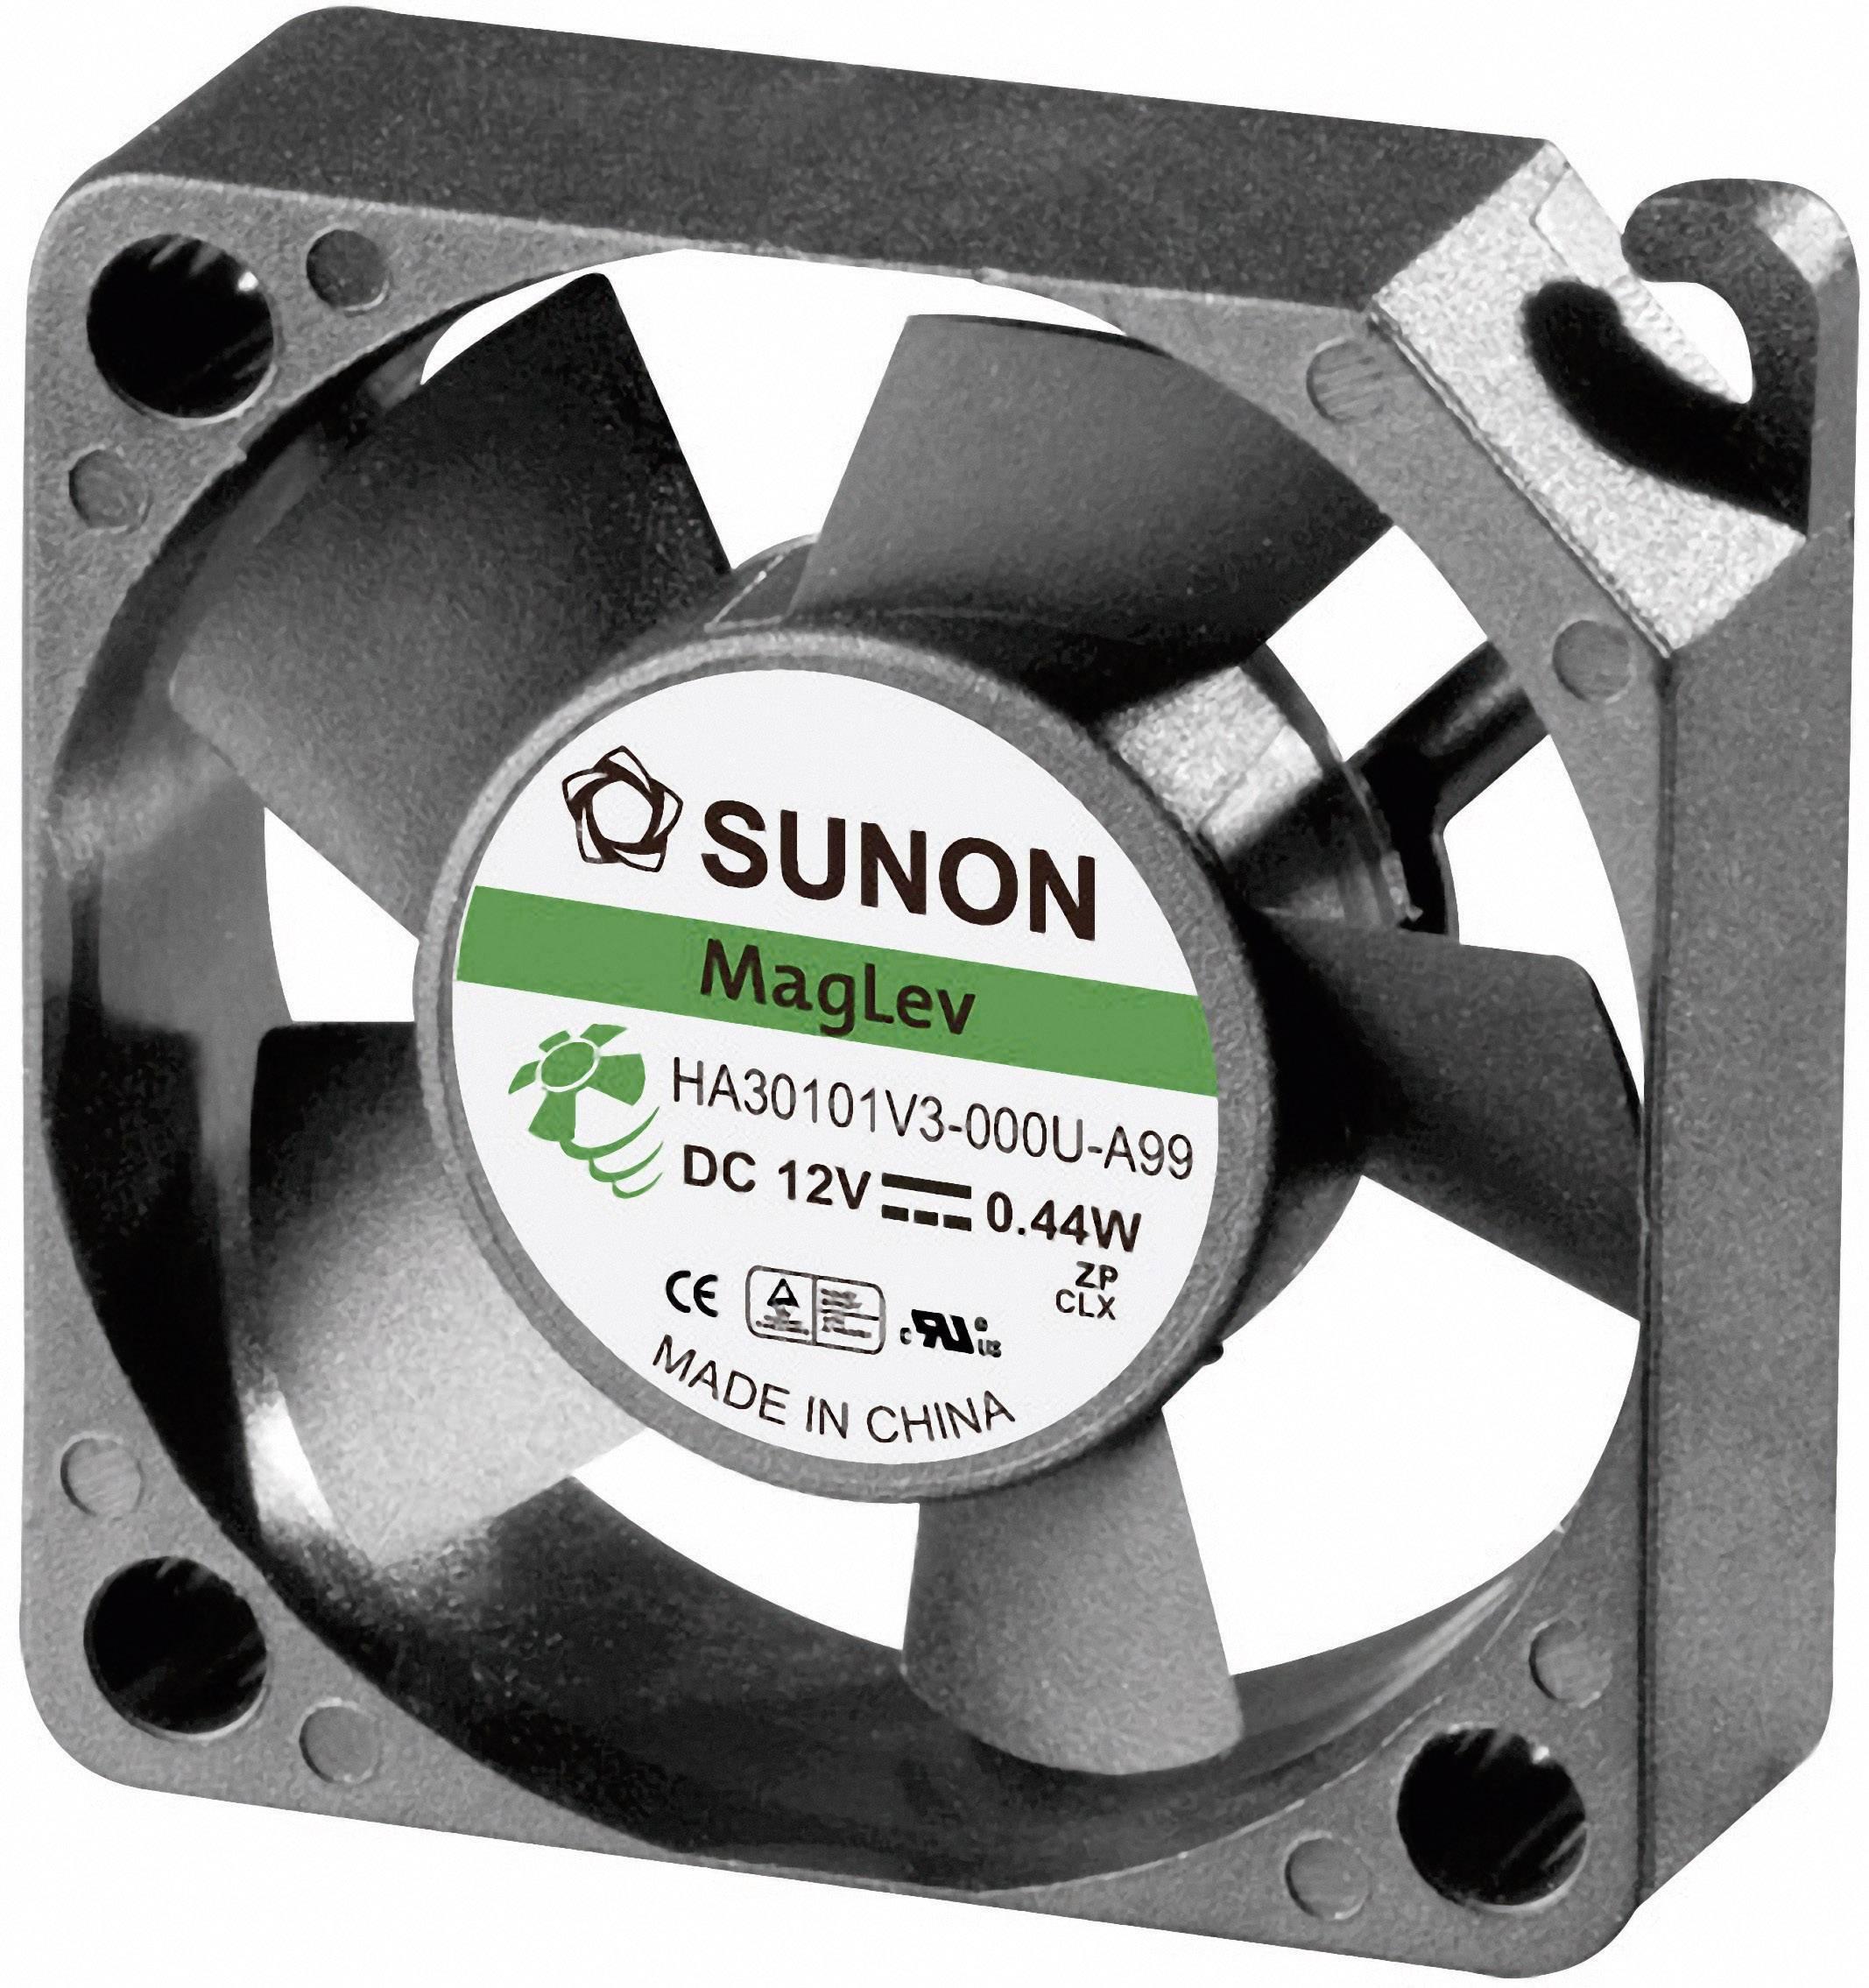 Ventilátor Sunon DR HA30101V3-0000-A99, 30 x 30 x 10 mm, 12V/DC